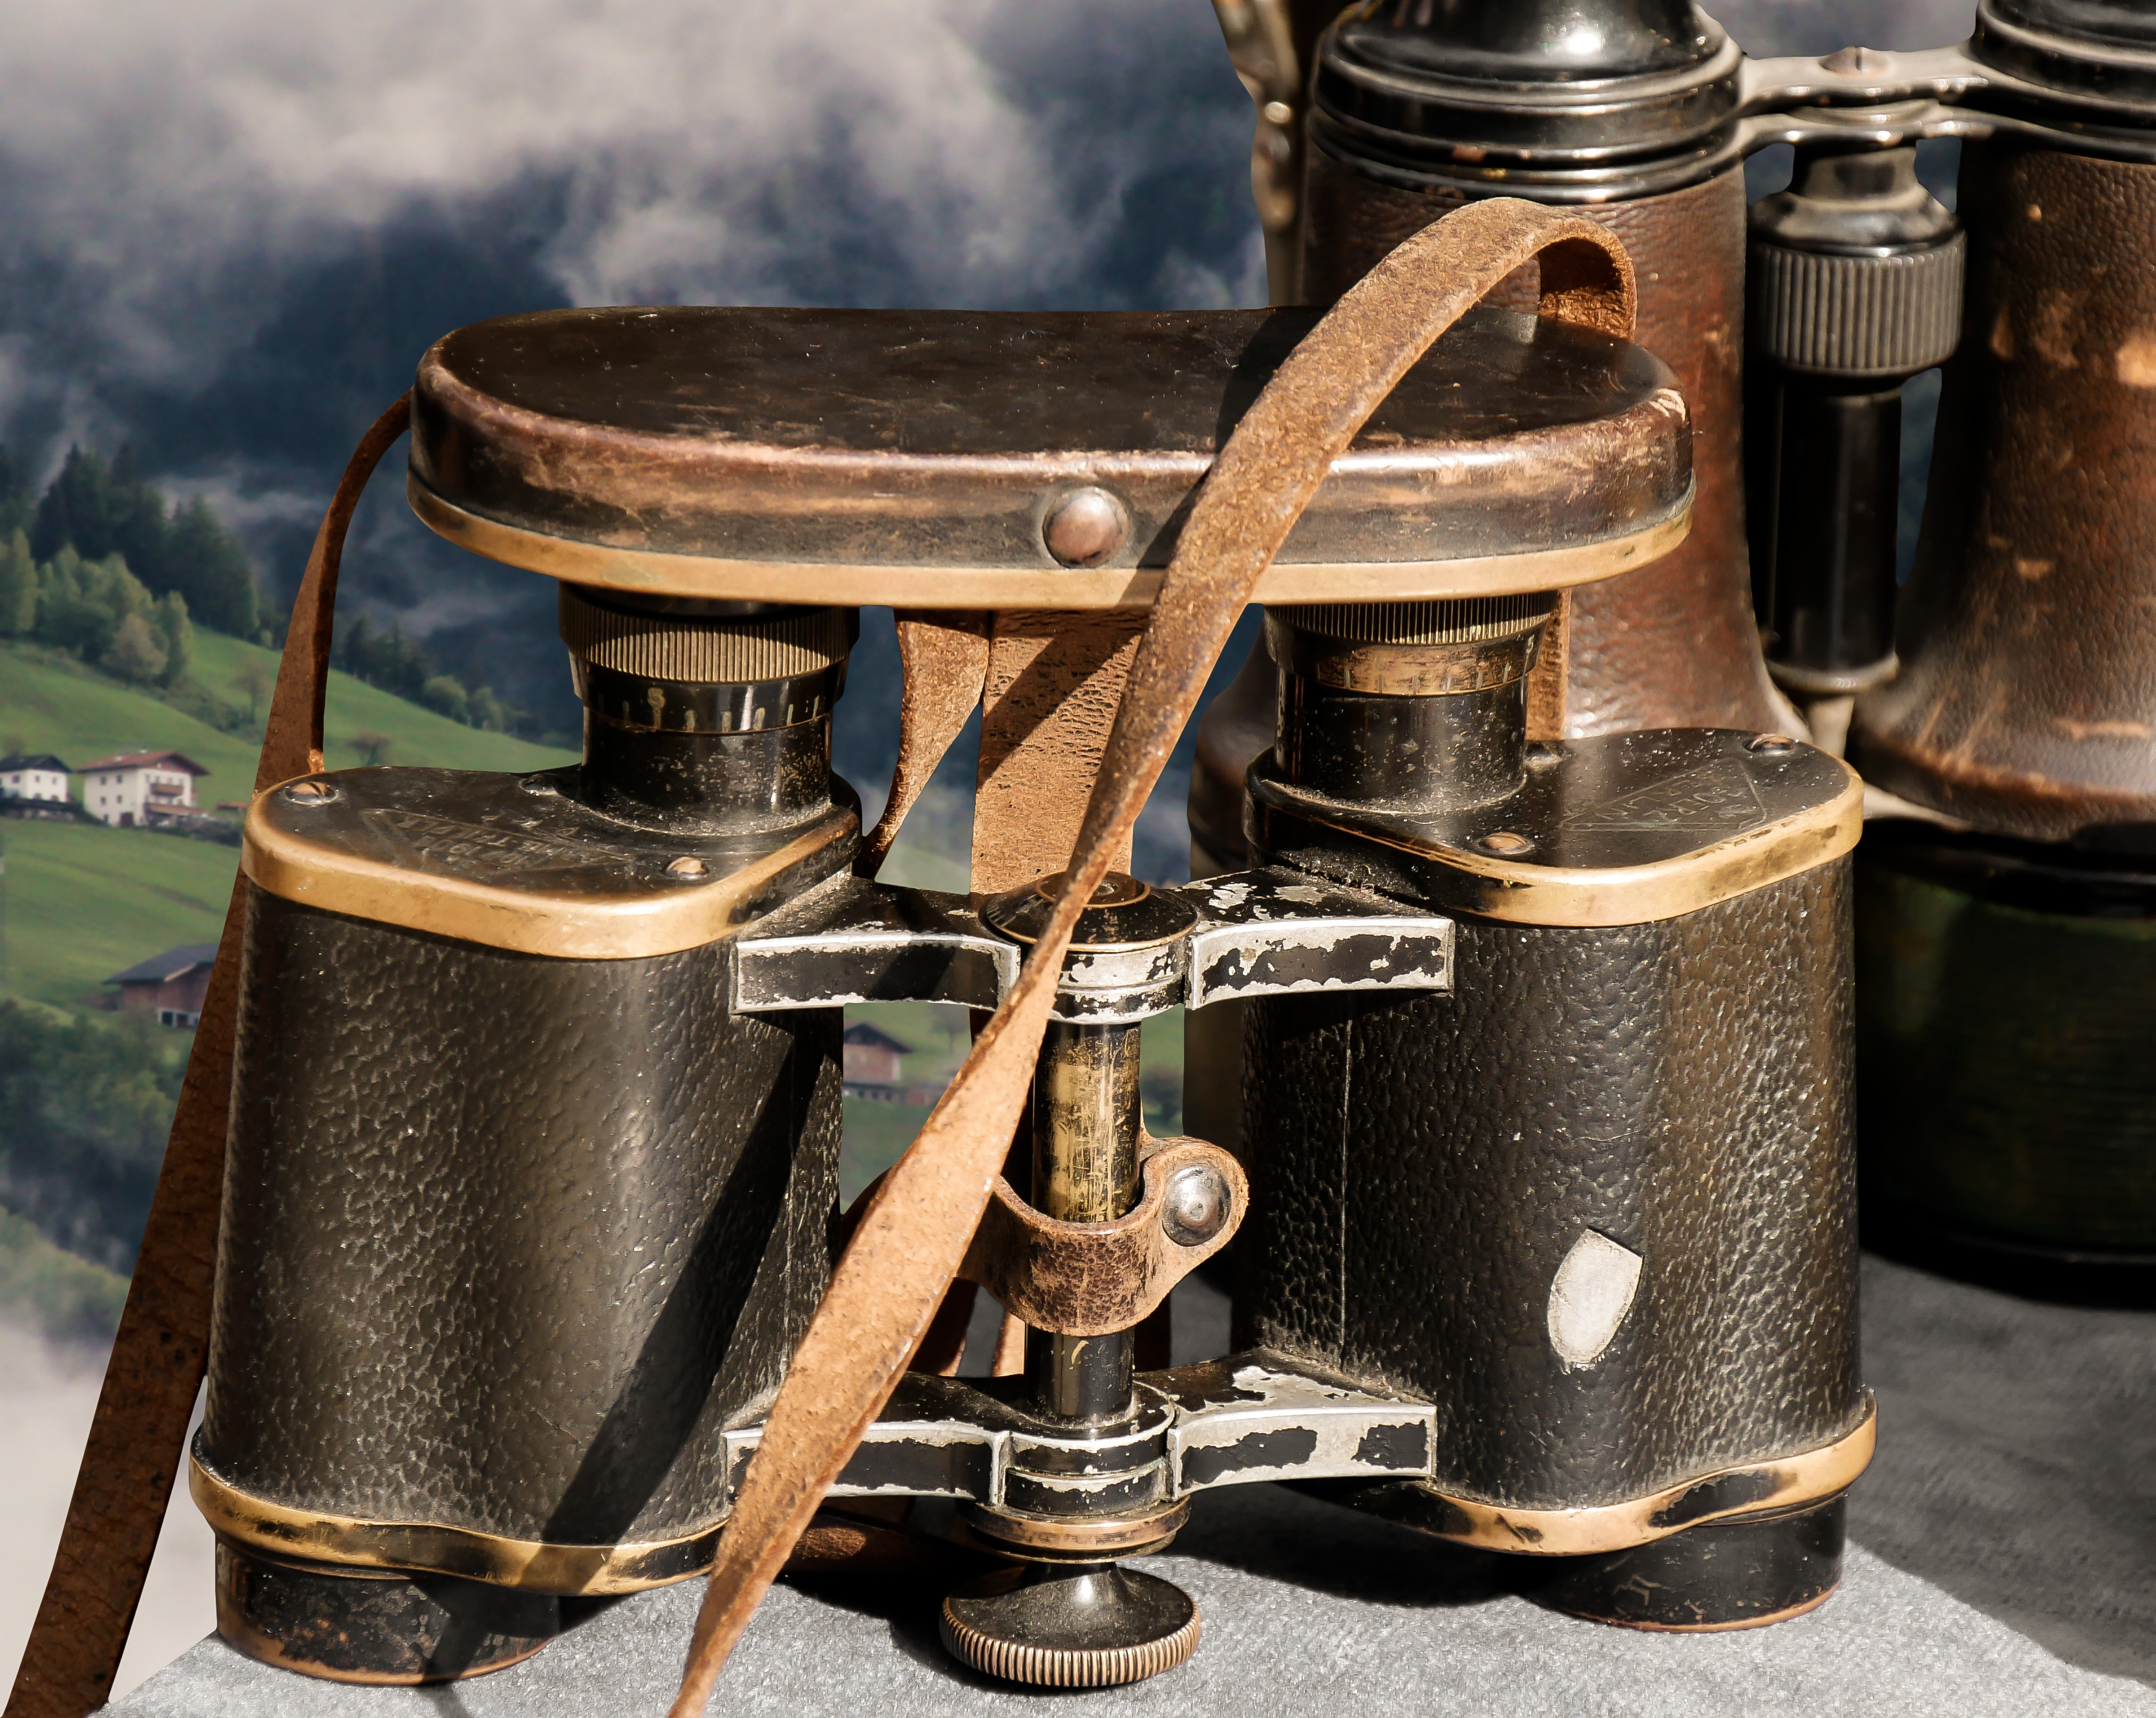 Old Binoculars, Binocular, Lens, Metal, Object, HQ Photo